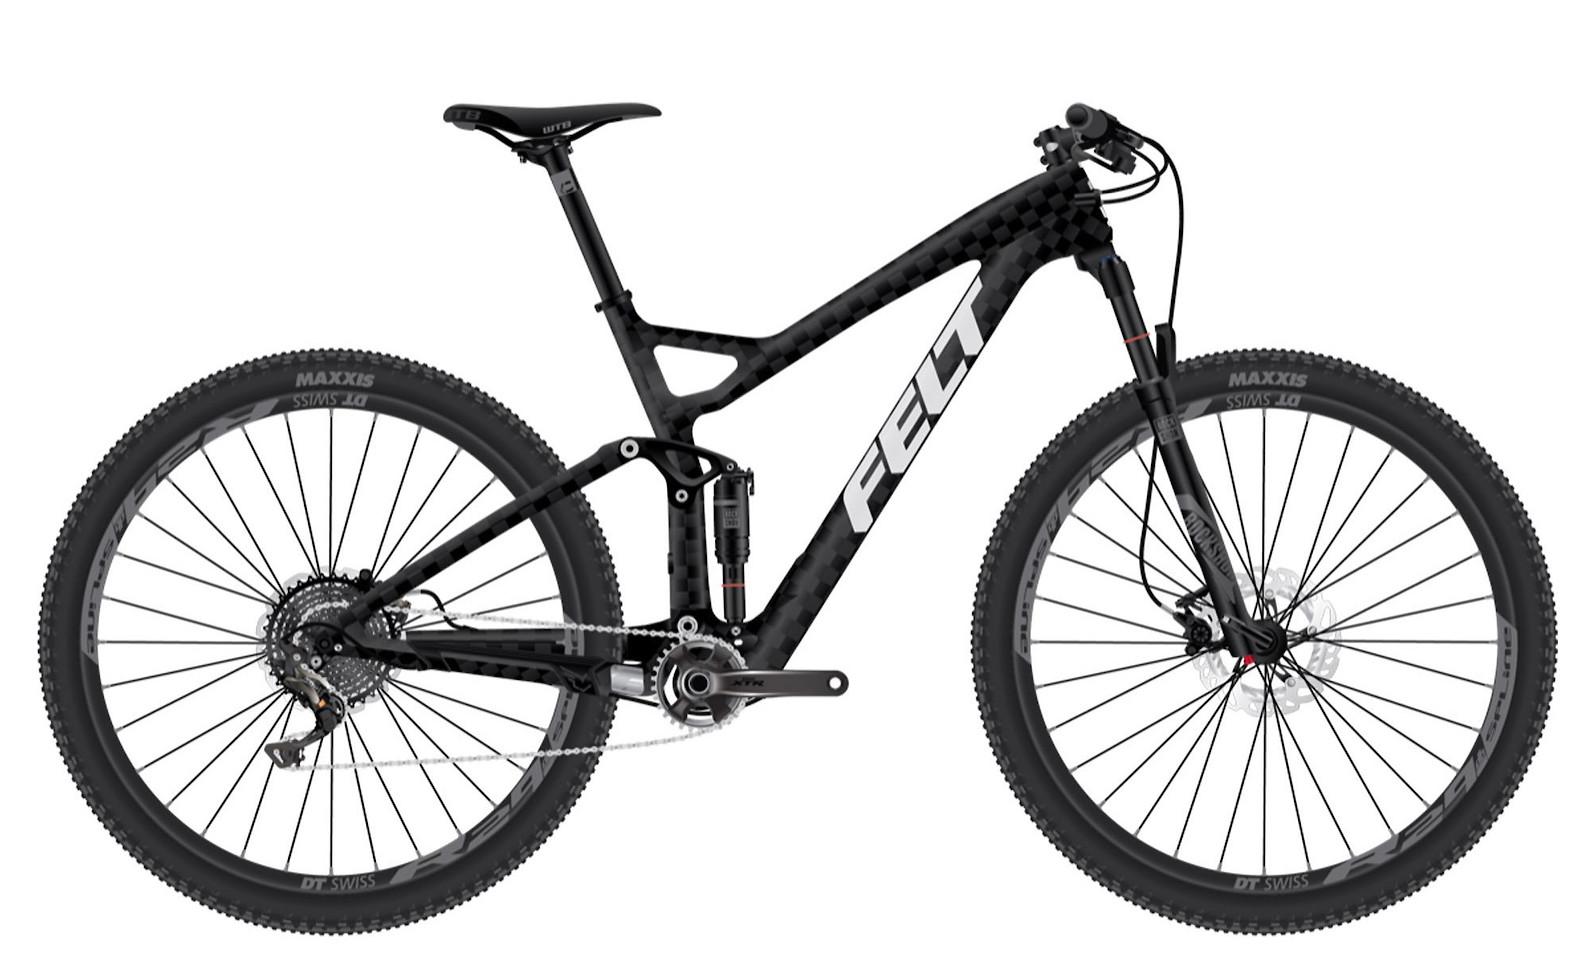 2019-Felt-Edict-FRD-bike-1